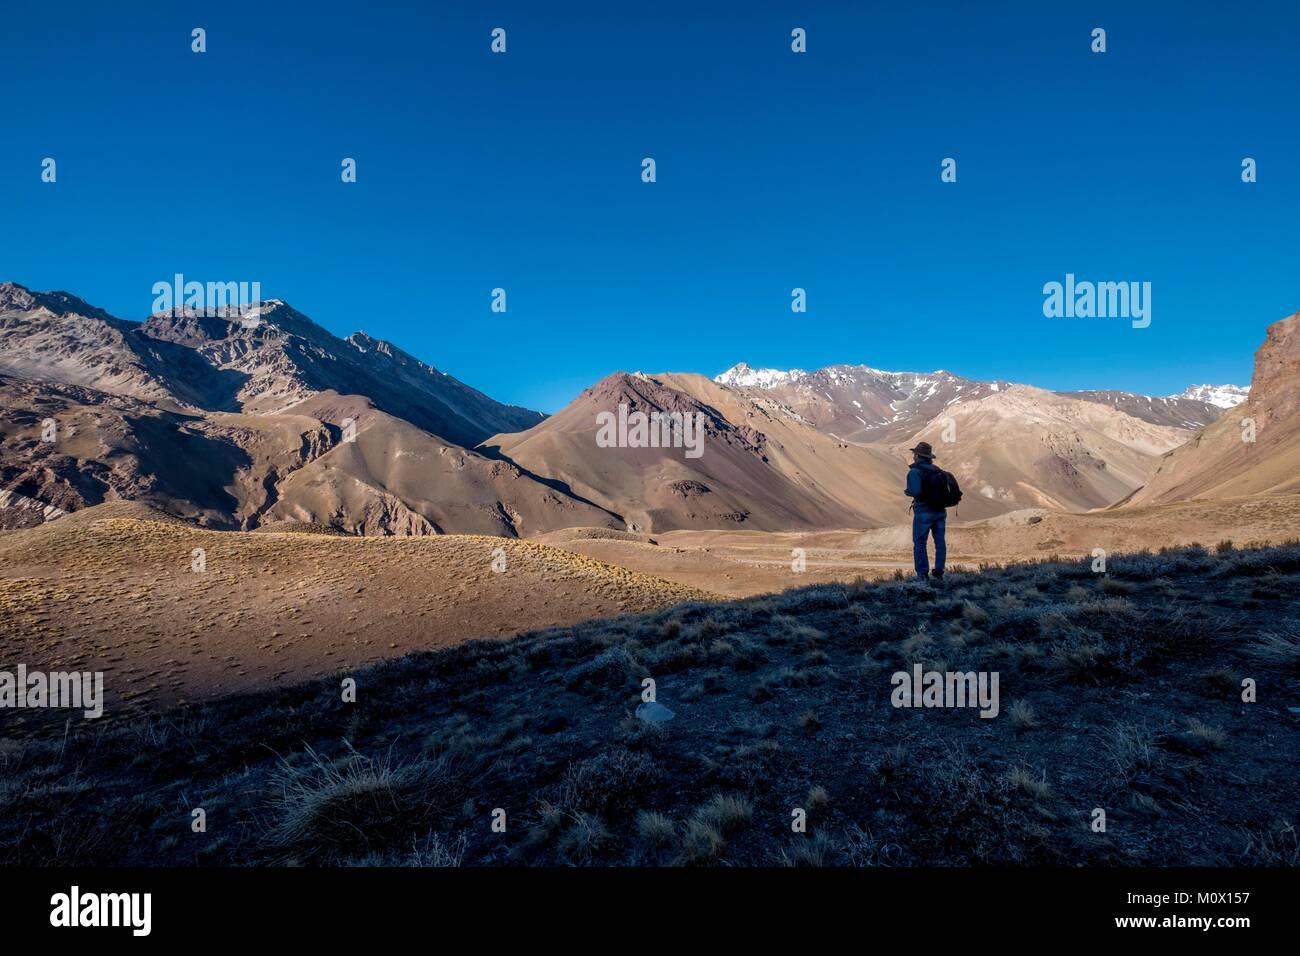 Argentina,Provincia de Mendoza,Parque Provincial Aconcagua Imagen De Stock